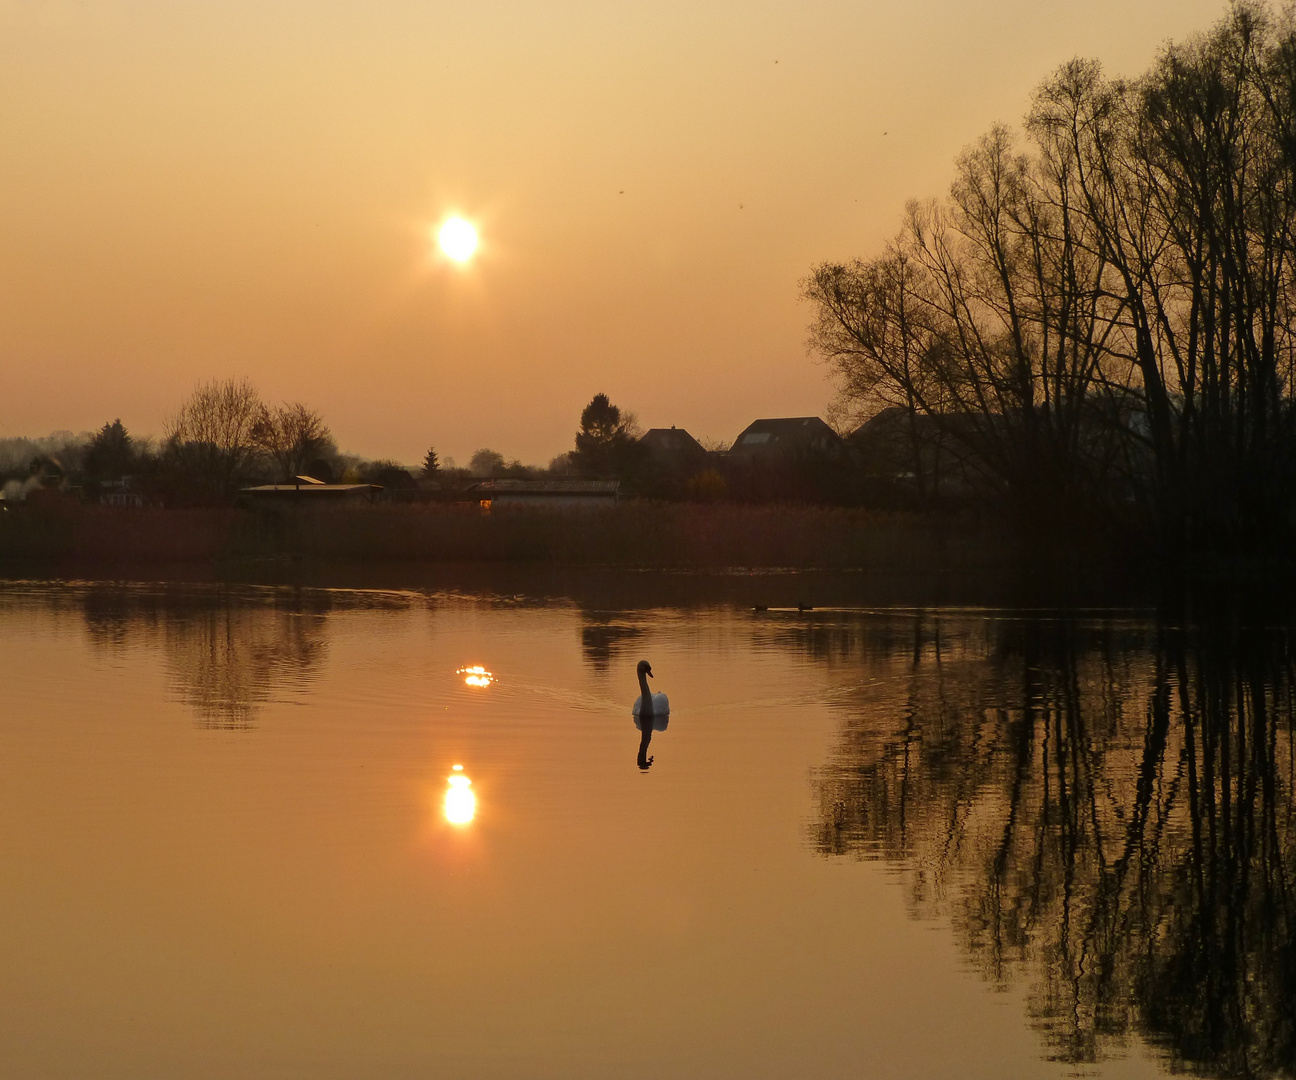 Sonnenuntergang heute Abend im Stadtpark